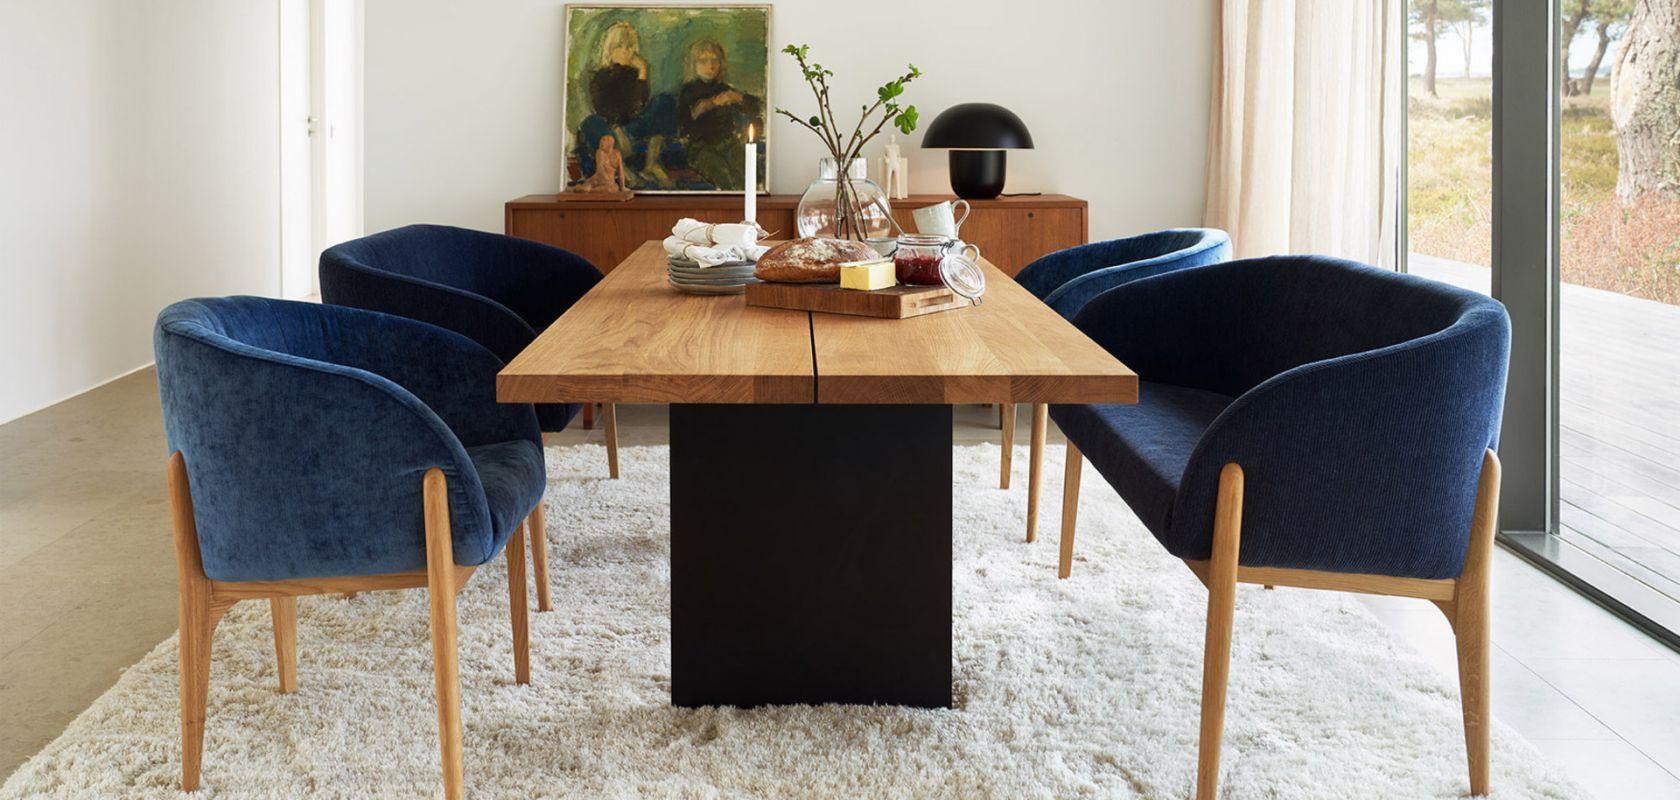 Jenny Bistro Interior Chair Elyot 11 Dark Blue Sofa Moss 14 Dark Blue 3